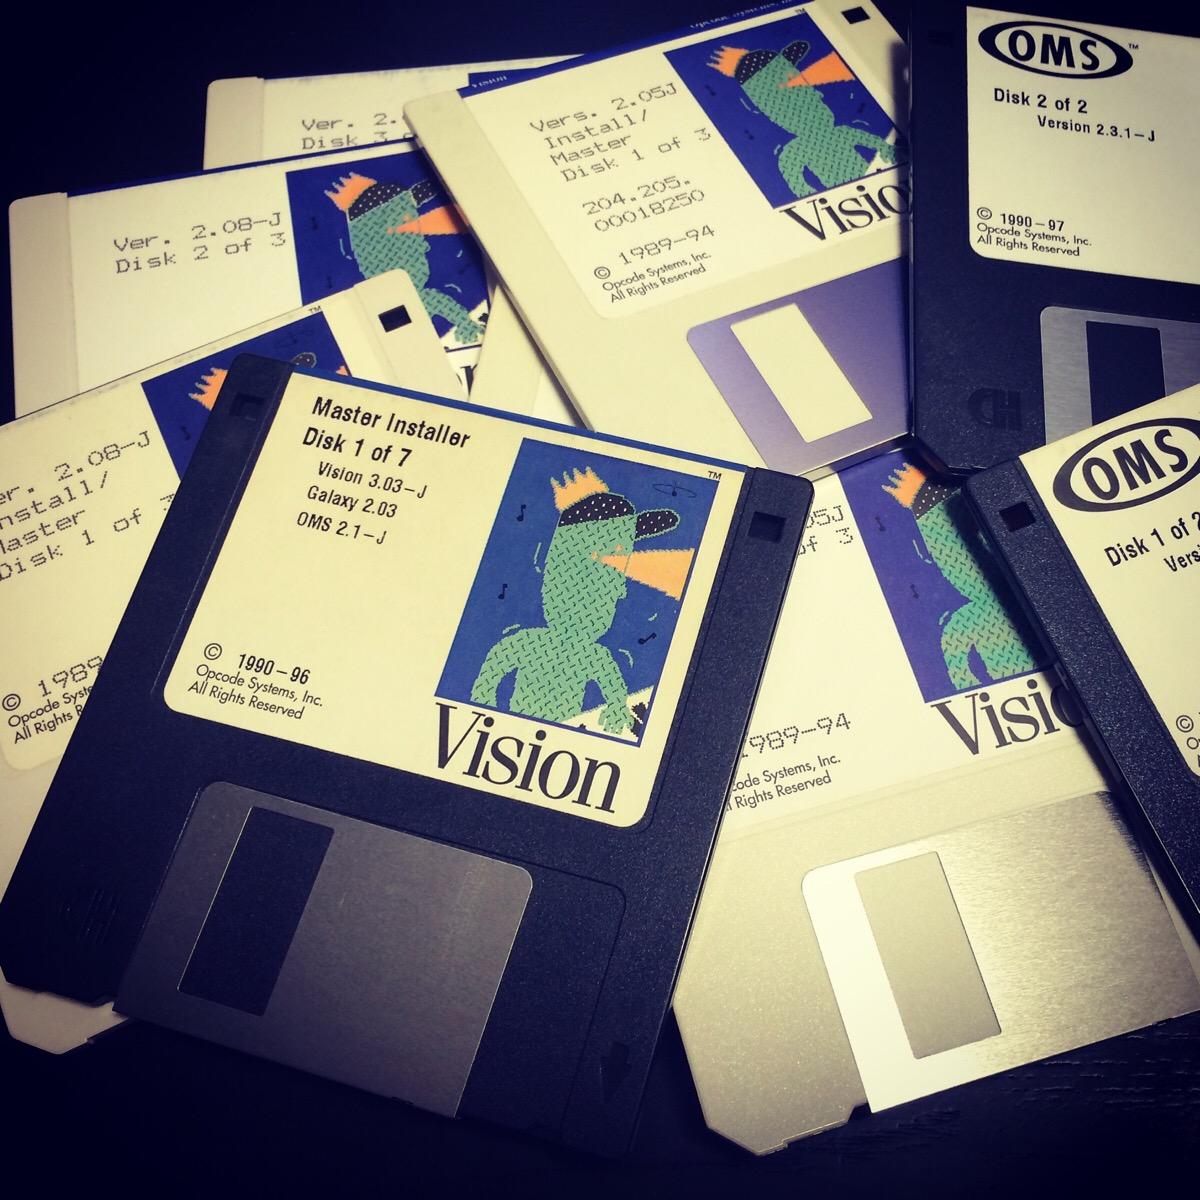 VISIONのインストールディスク